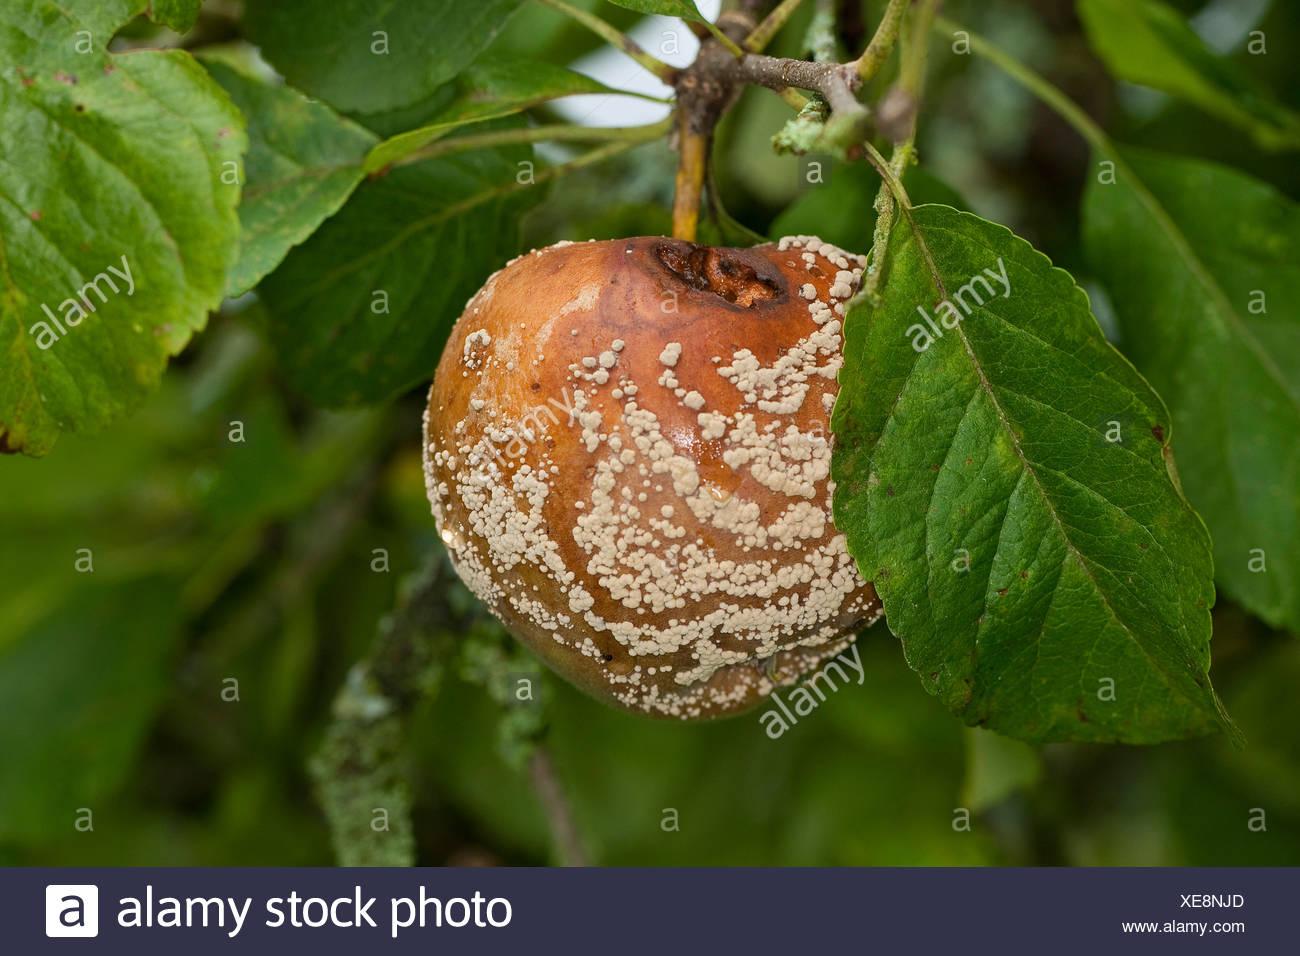 Brown rot (Monilia fructigena, Monilinia fructigena), fouling apple, Germany - Stock Image